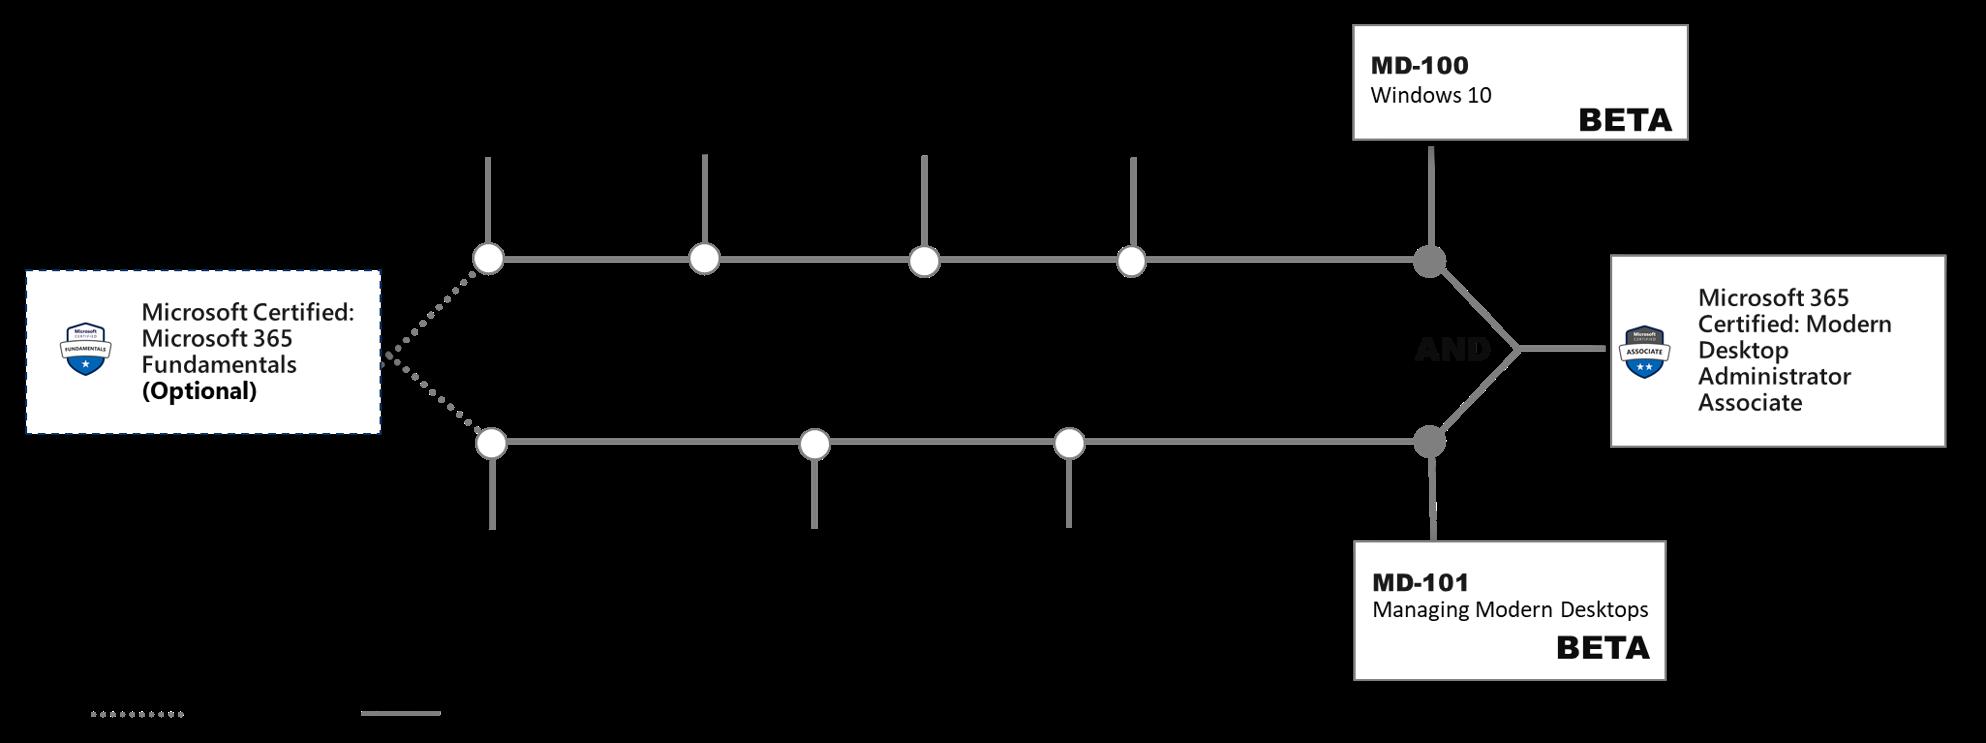 Modern_Desktop_MD100_MD101_Path